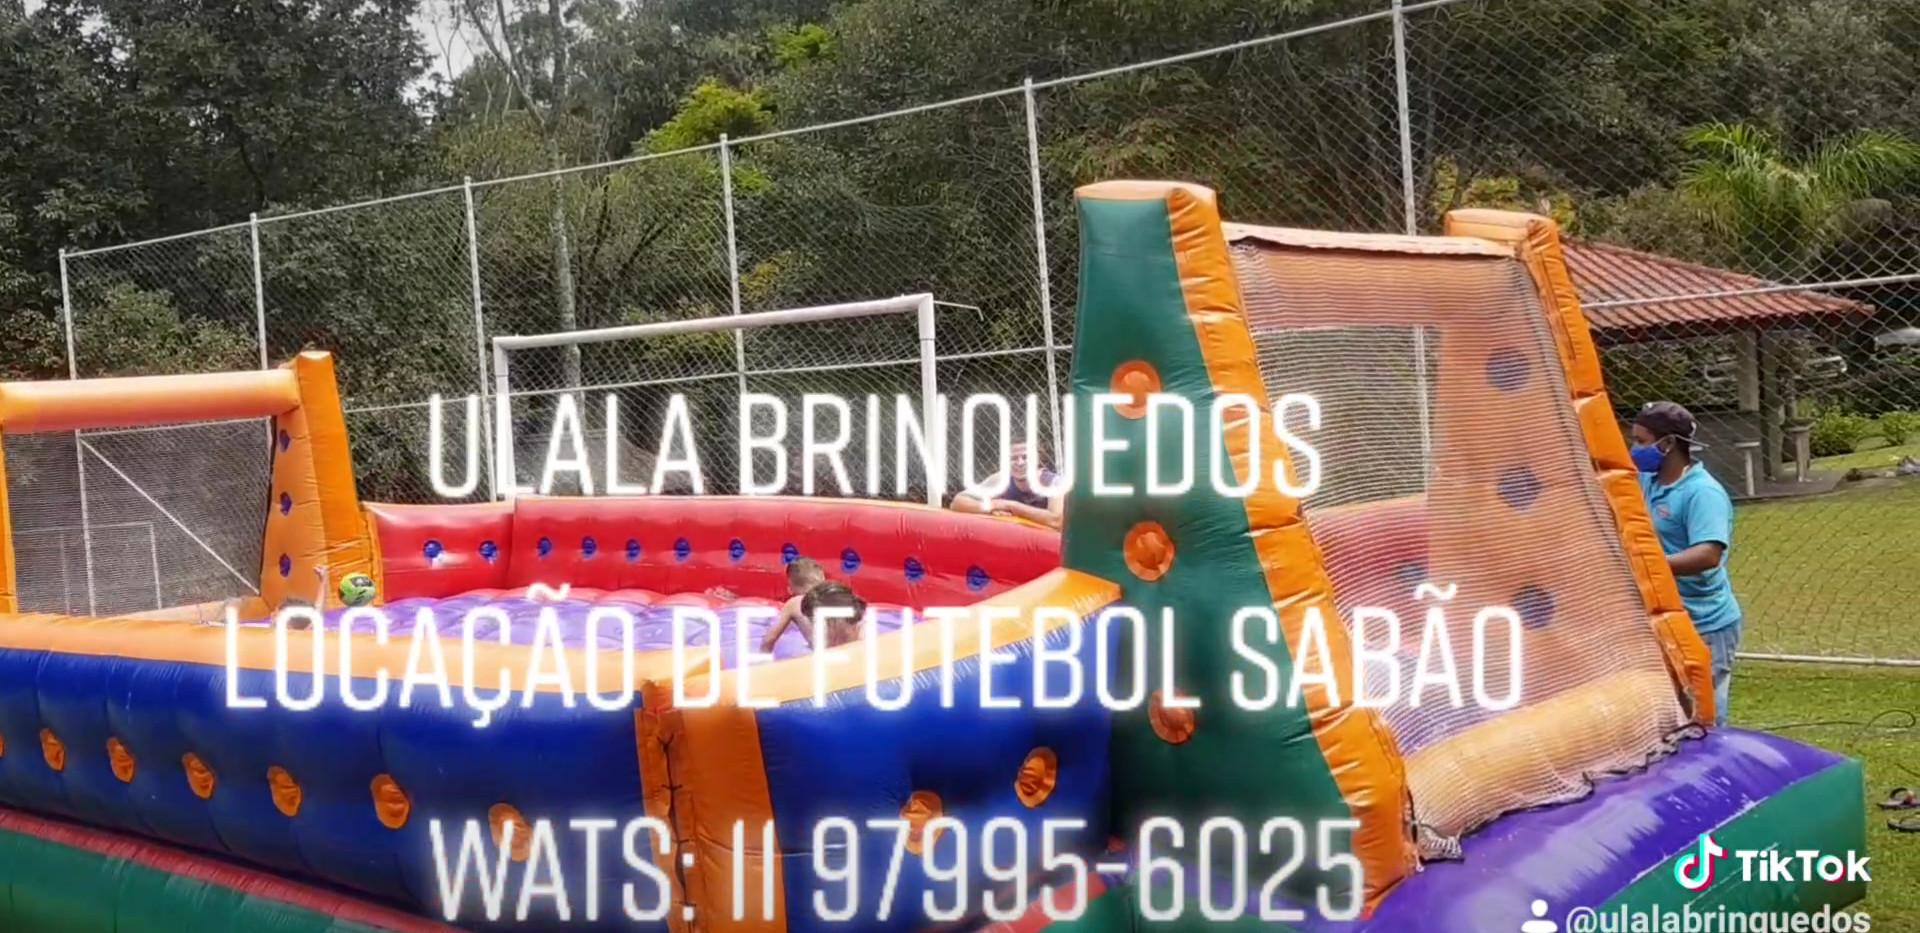 2021-03-02-003008043.mp4